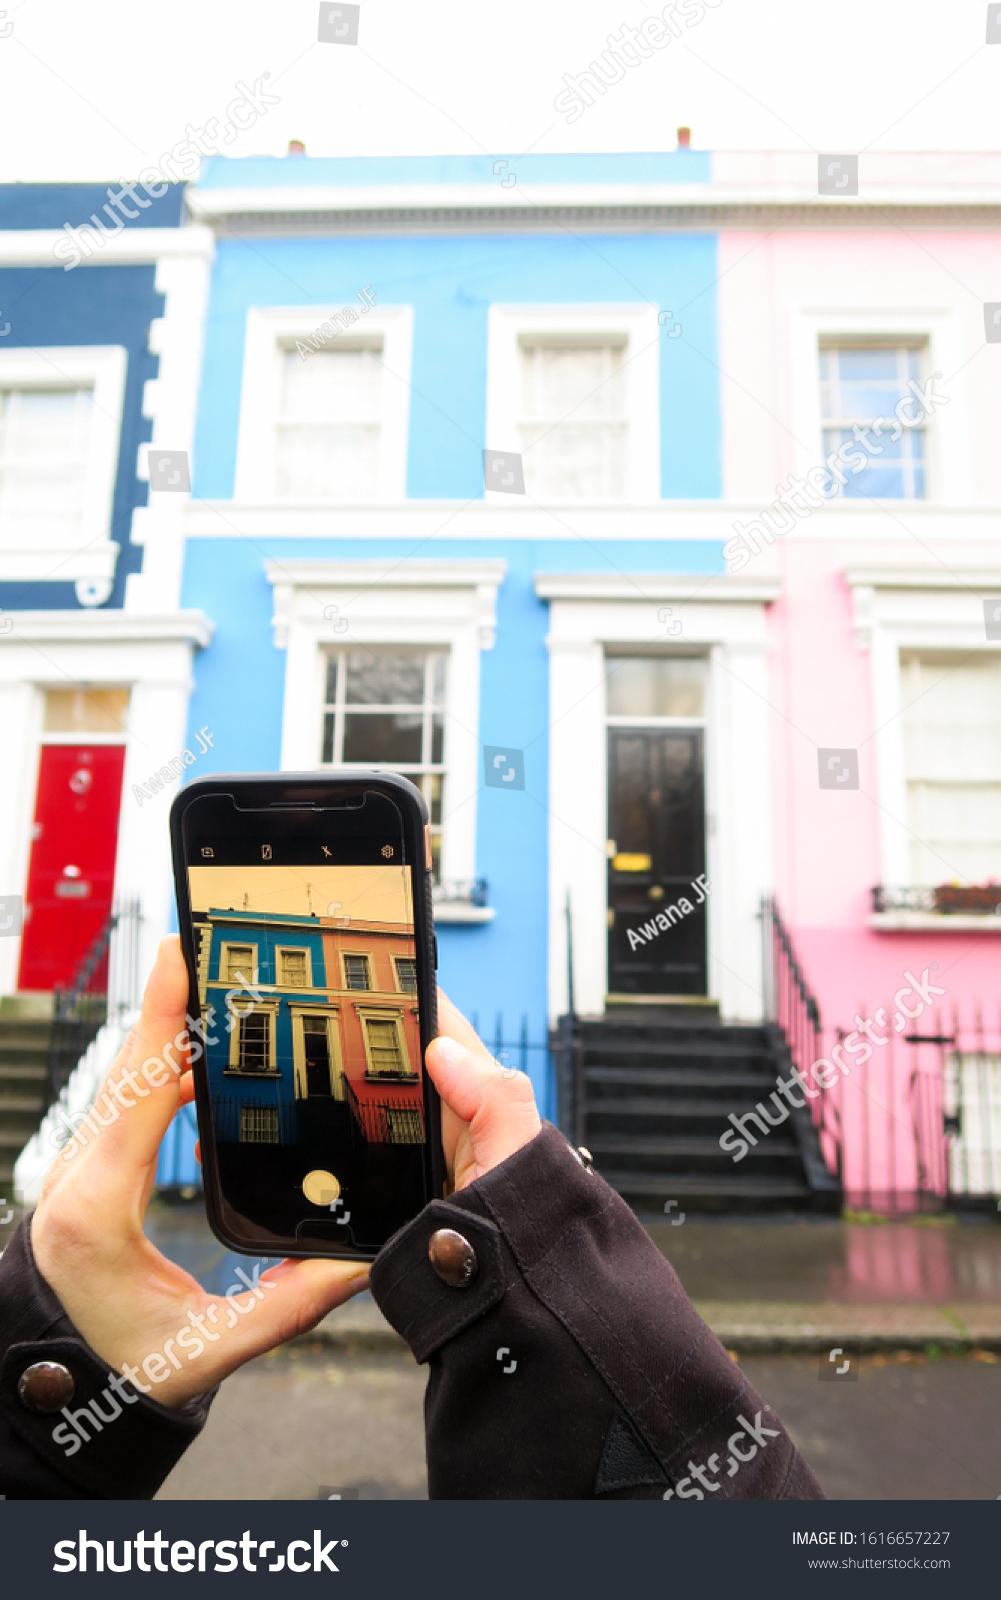 stock-photo-london-uk-january-closeup-of